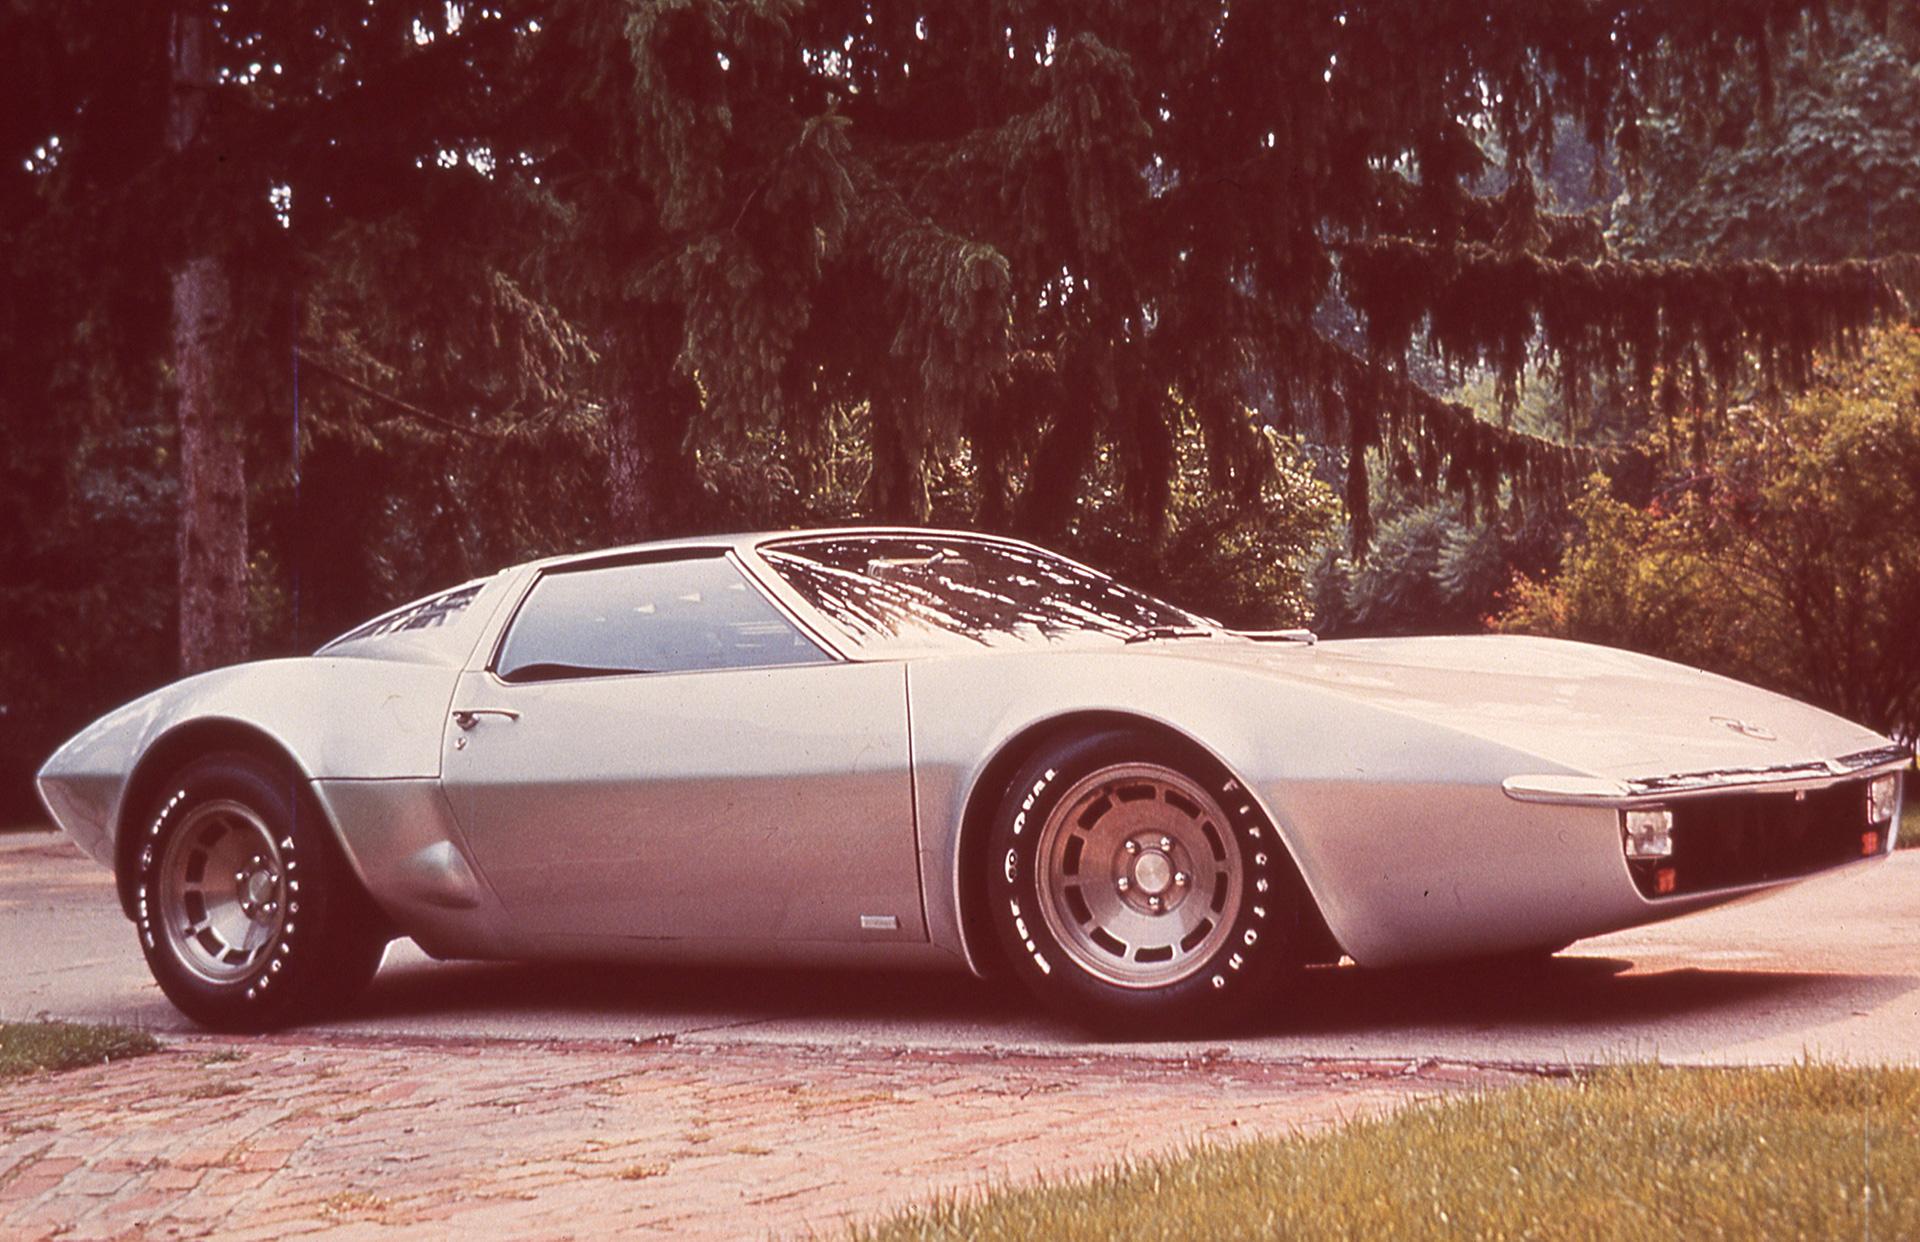 1973 Chevrolet XP-882